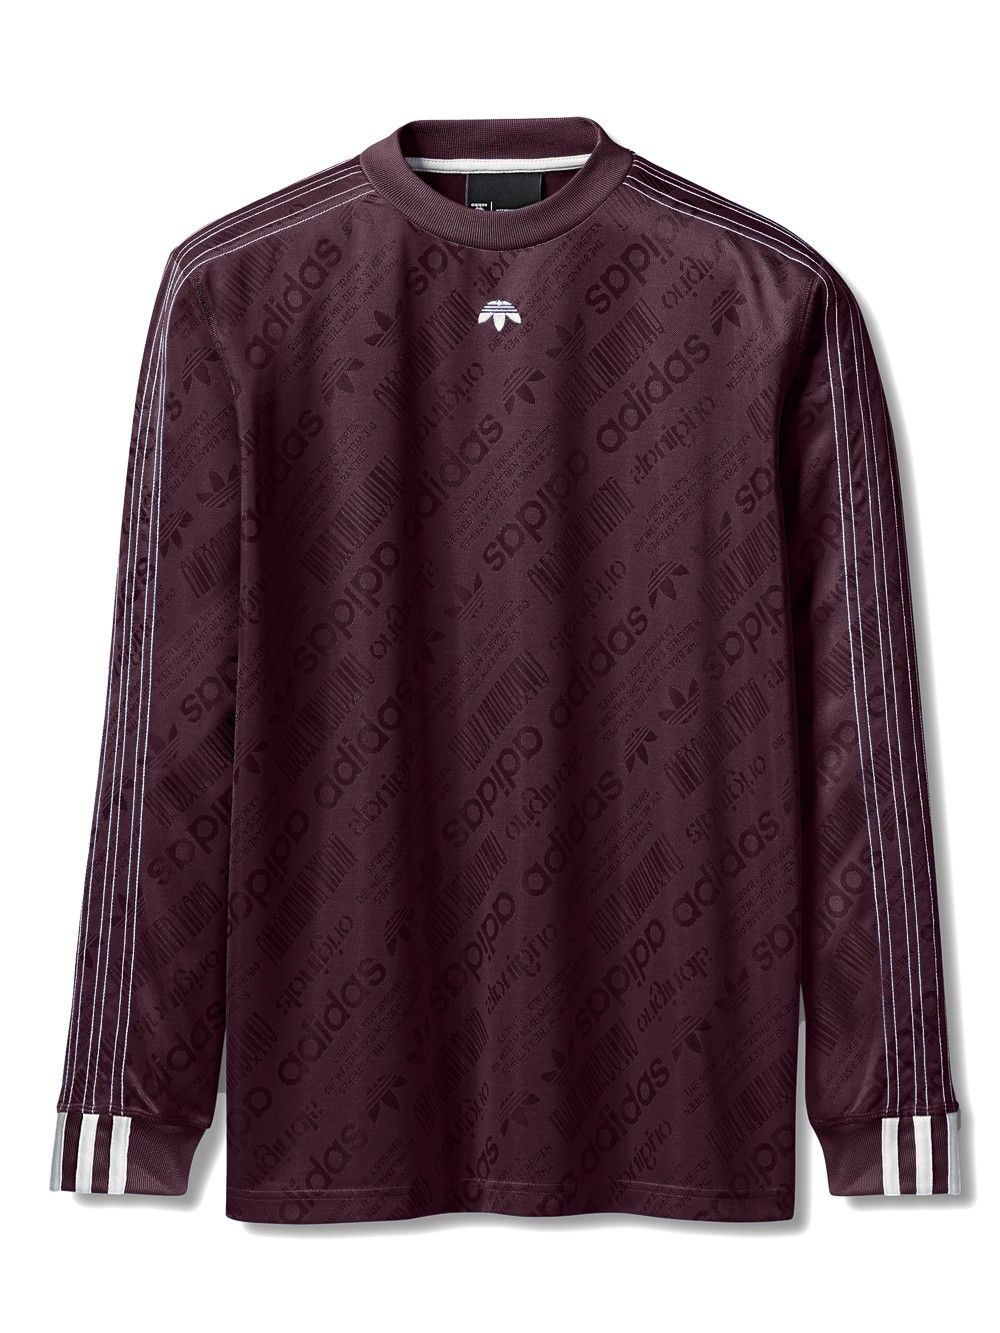 100% authentic e76e9 9b45c ADIDAS ORIGINALS BY ALEXANDER WANG Football Jersey Long Sleeve.  adidasoriginalsbyalexanderwang cloth